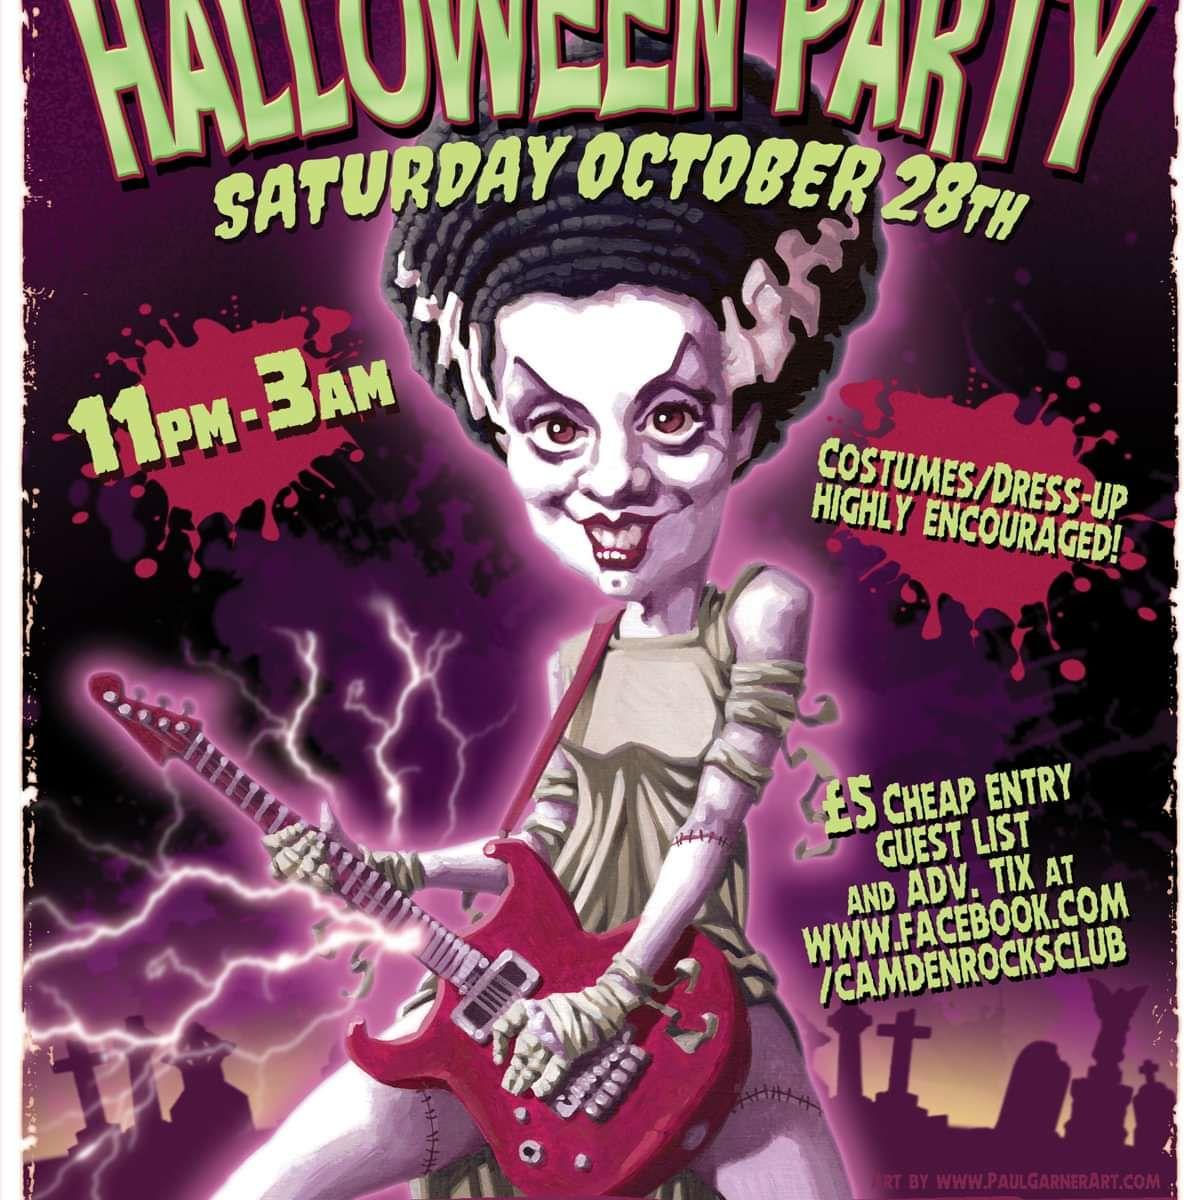 Asombroso Halloween Dress Up Party Bosquejo - Ideas de Vestidos de ...